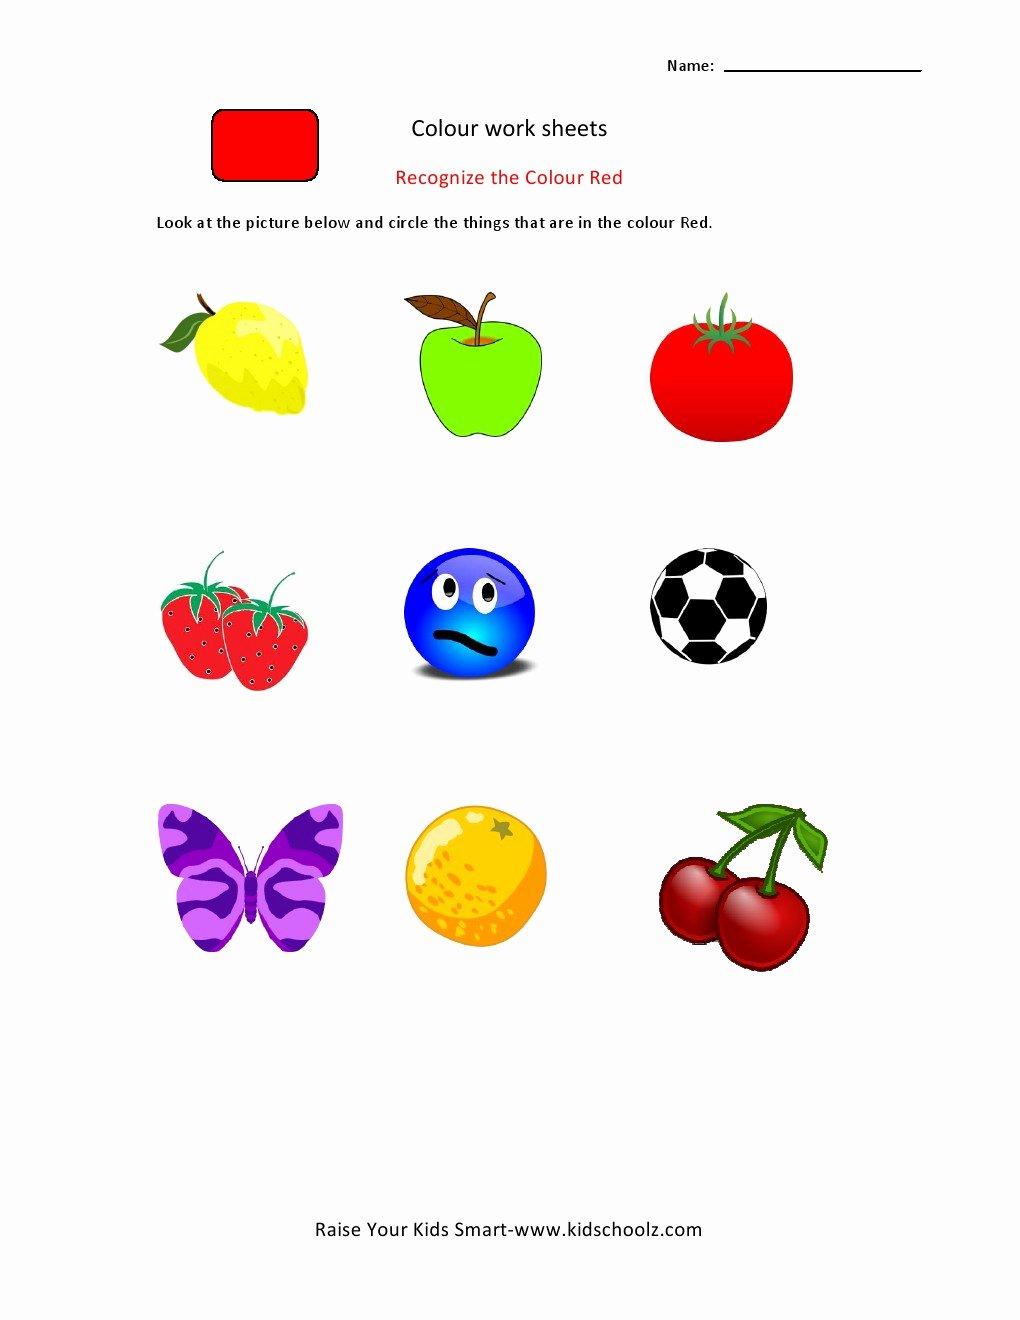 Colour Recognition Worksheets for Preschoolers Kids Colour Recognition Worksheets Kidschoolz